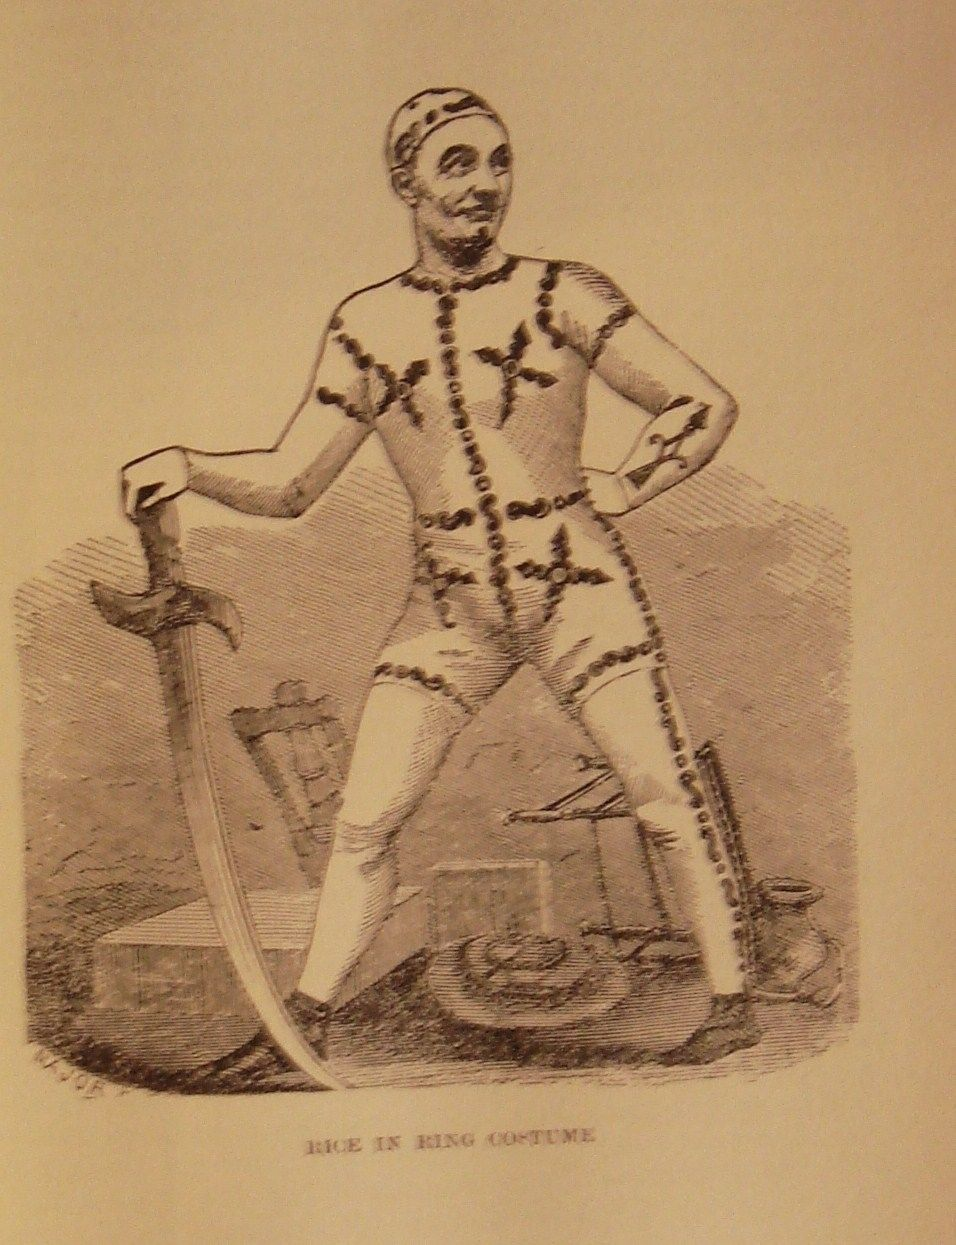 THE LIFE OF DAN RICE, by Maria Ward Brown - 1901